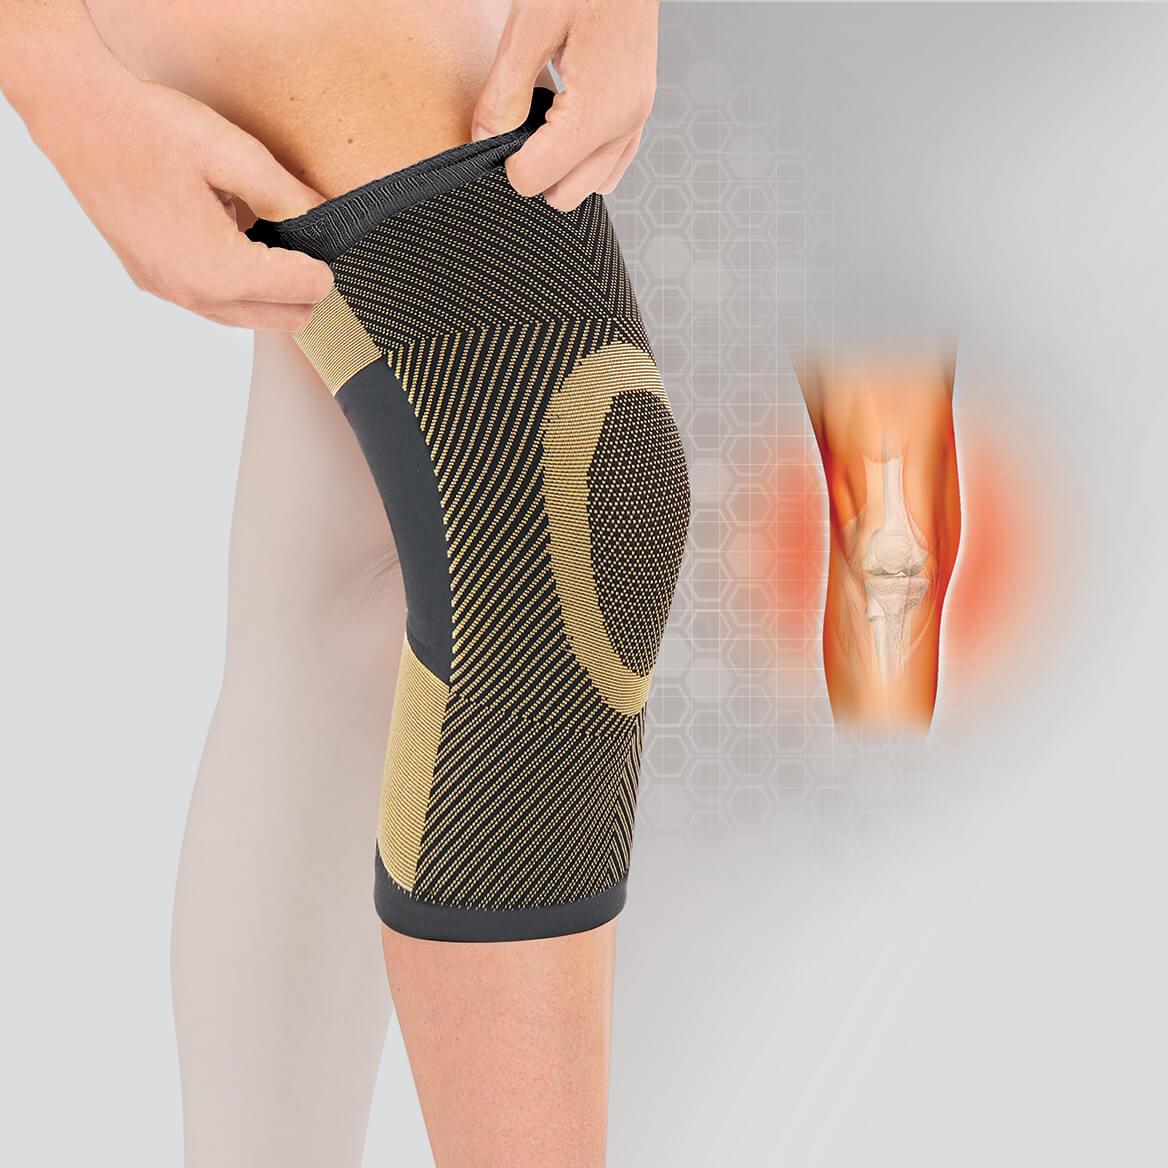 Copper Compression Knee Support-370124